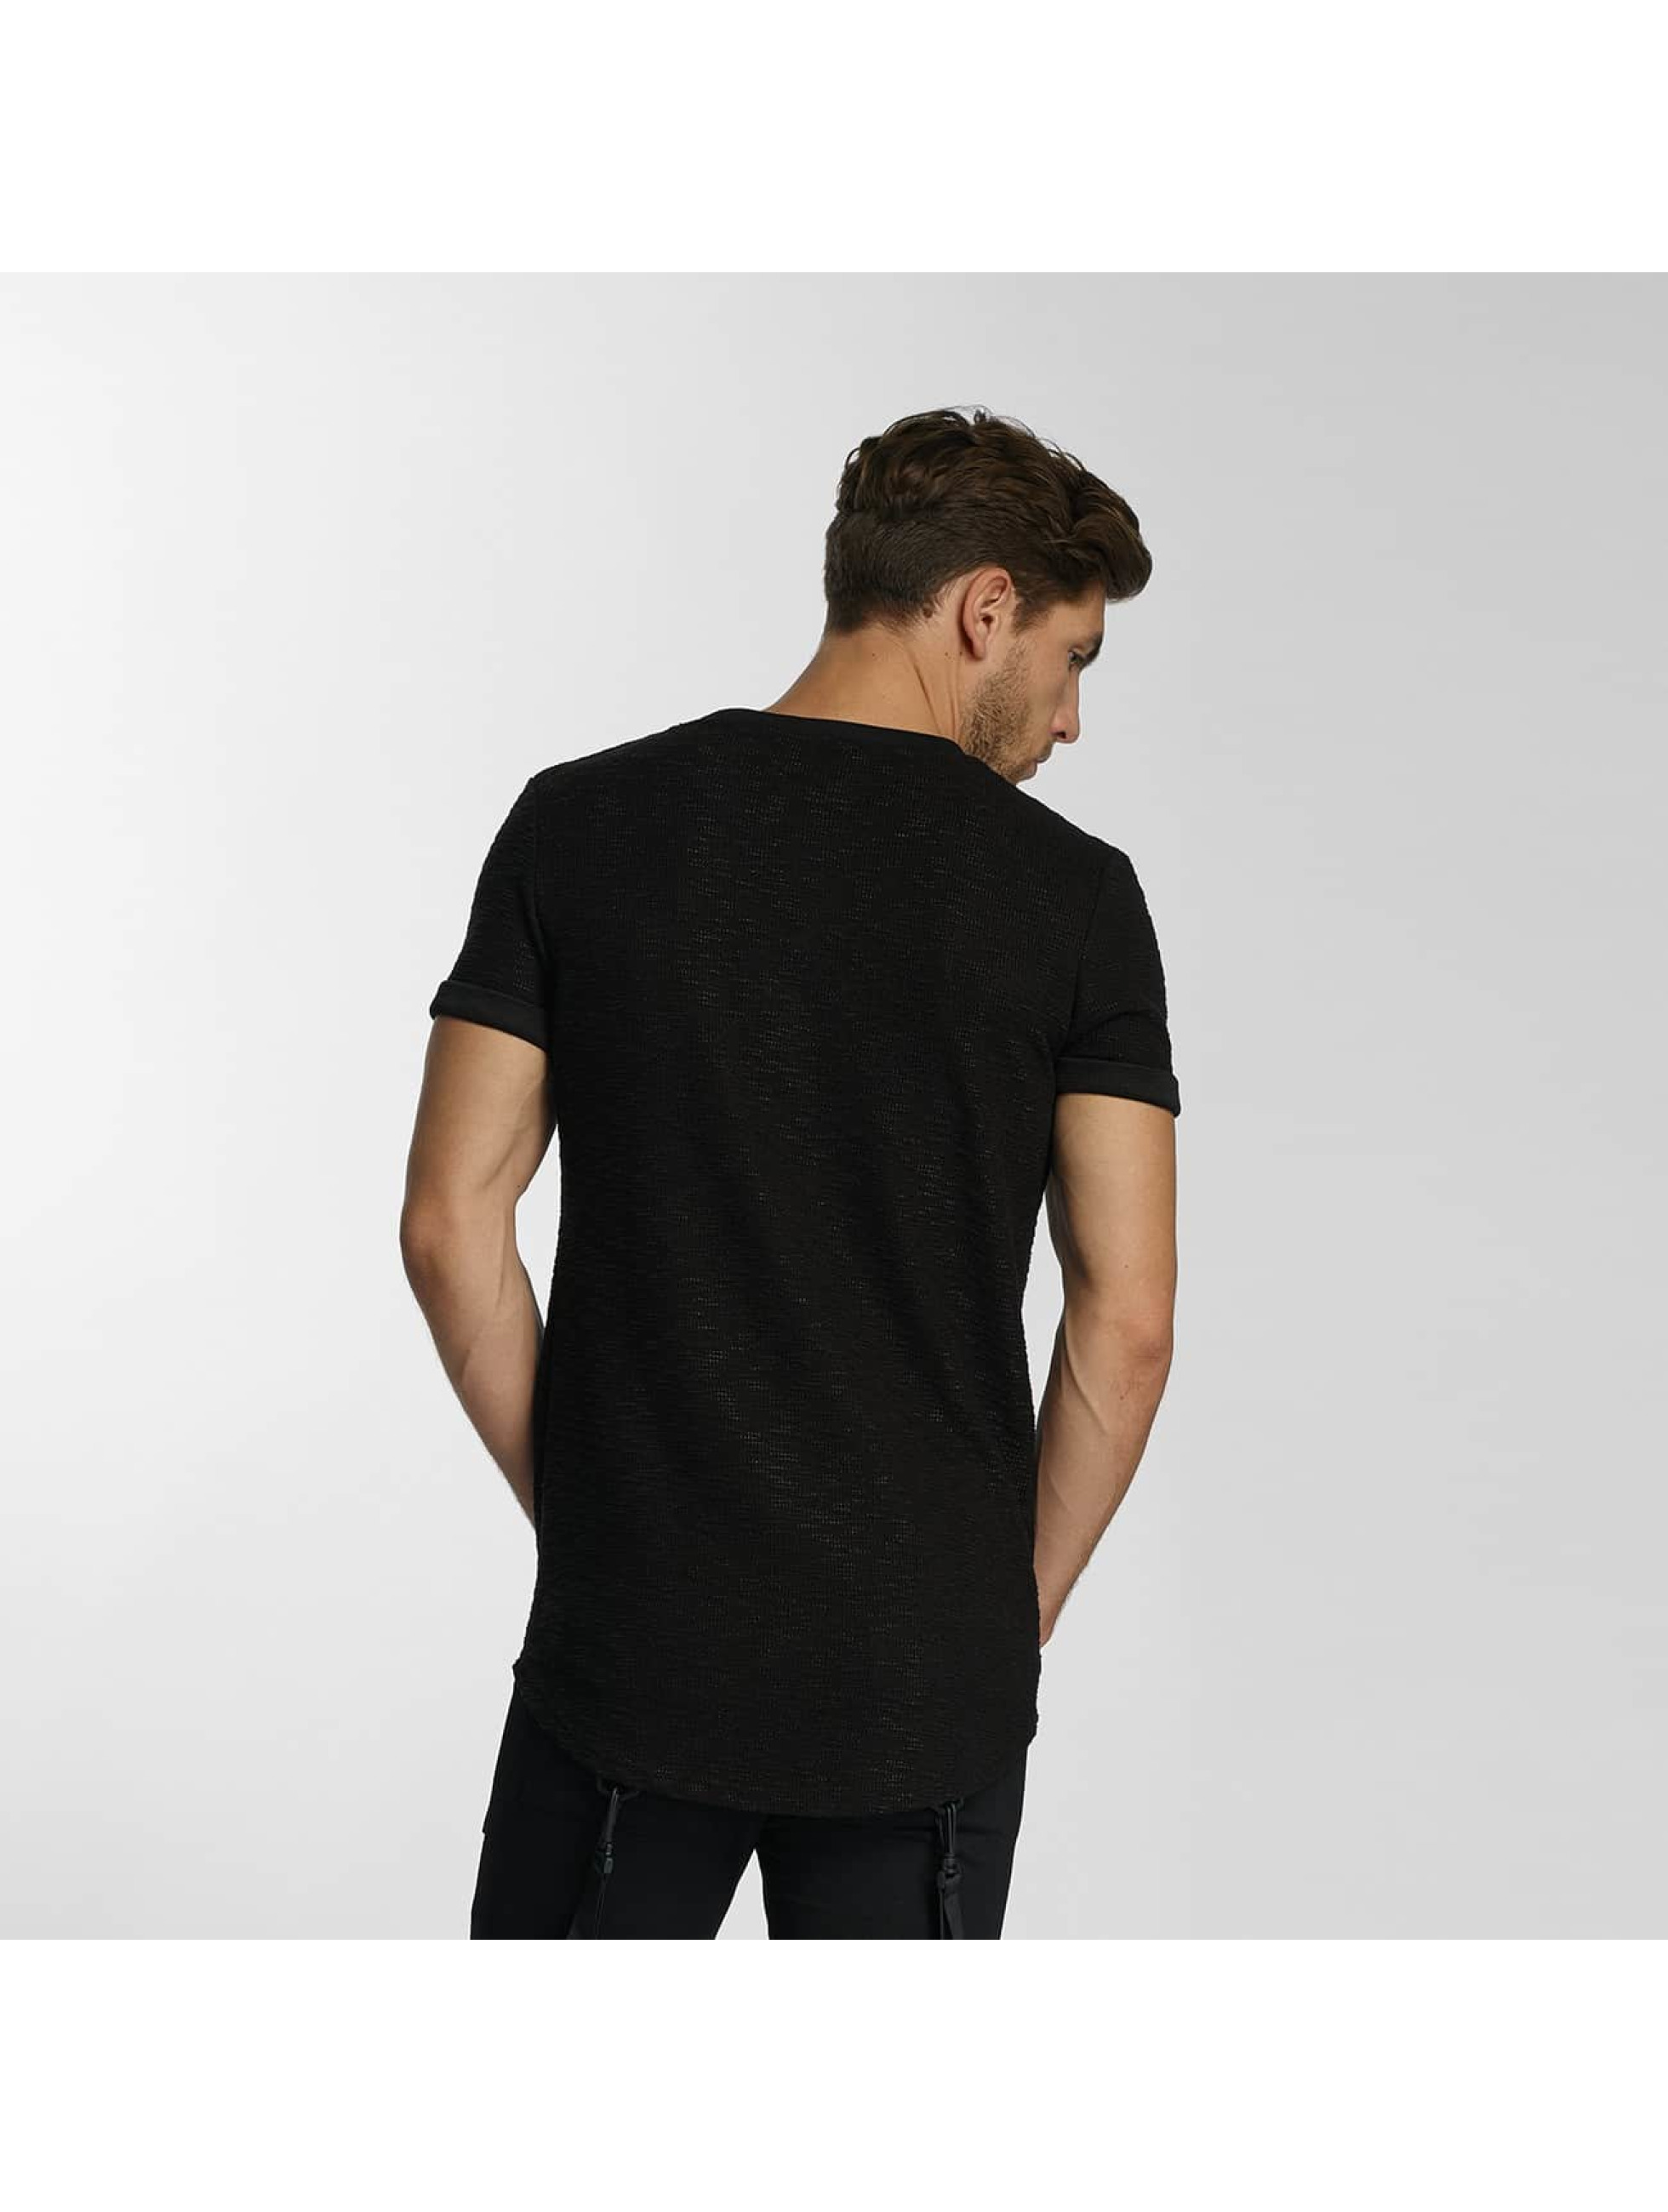 Paris Premium Tall Tees Knit black